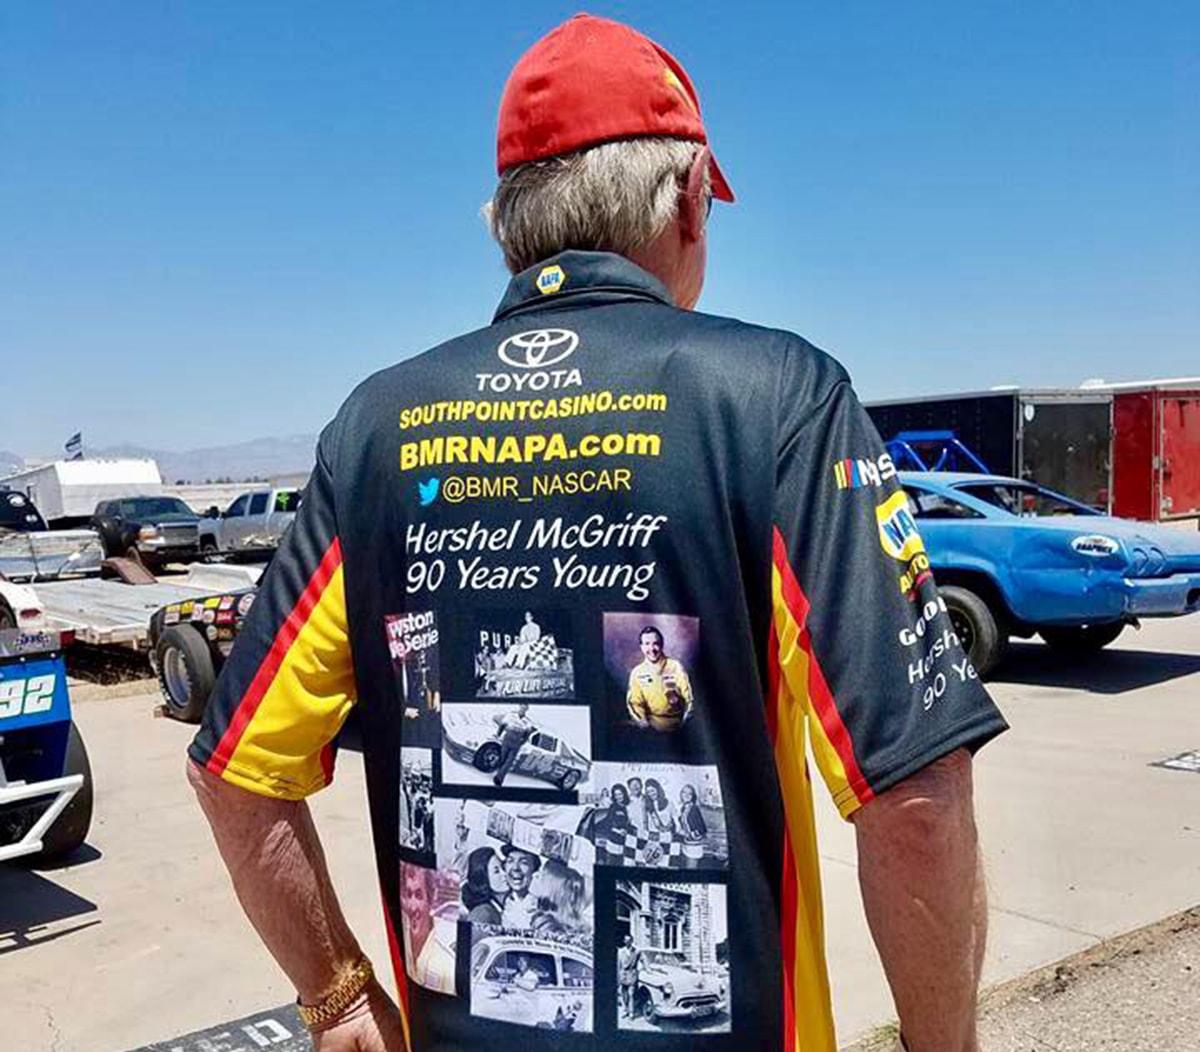 NASCAR Legend McGriff Takes the Wheel Again at Age 90